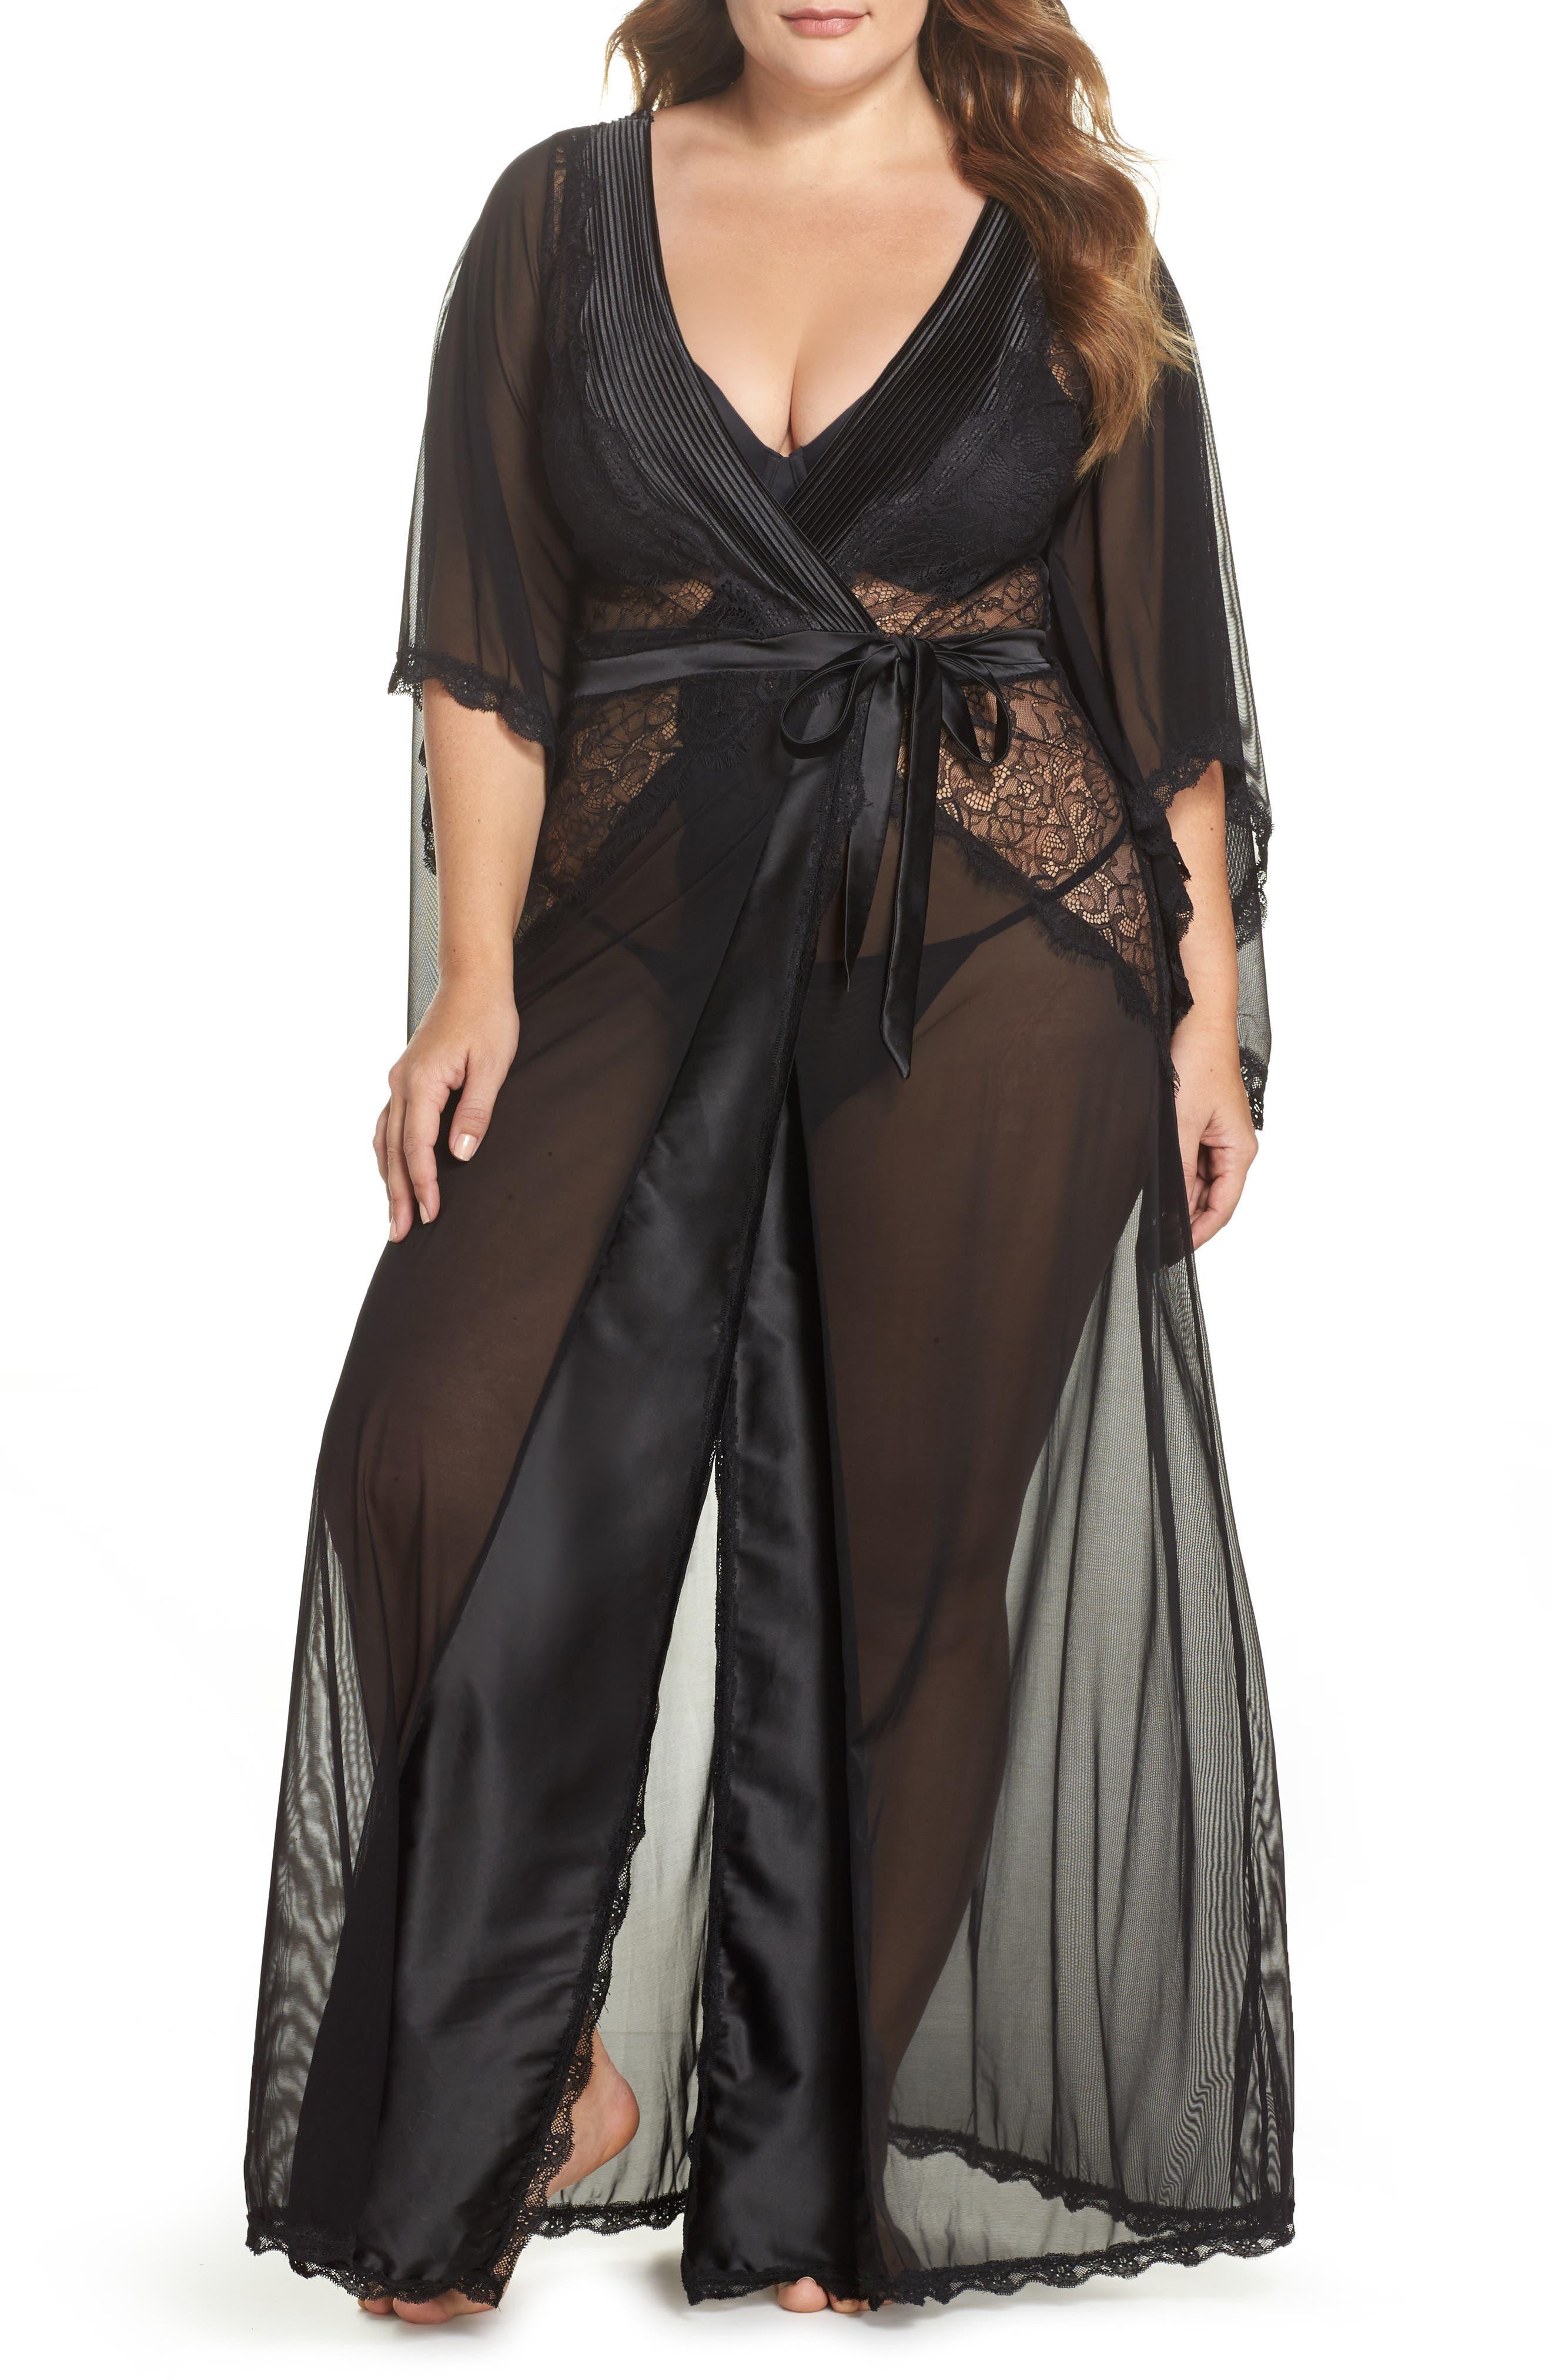 Nicolette Sheer Robe & G-String,                         Main,                         color, BLACK